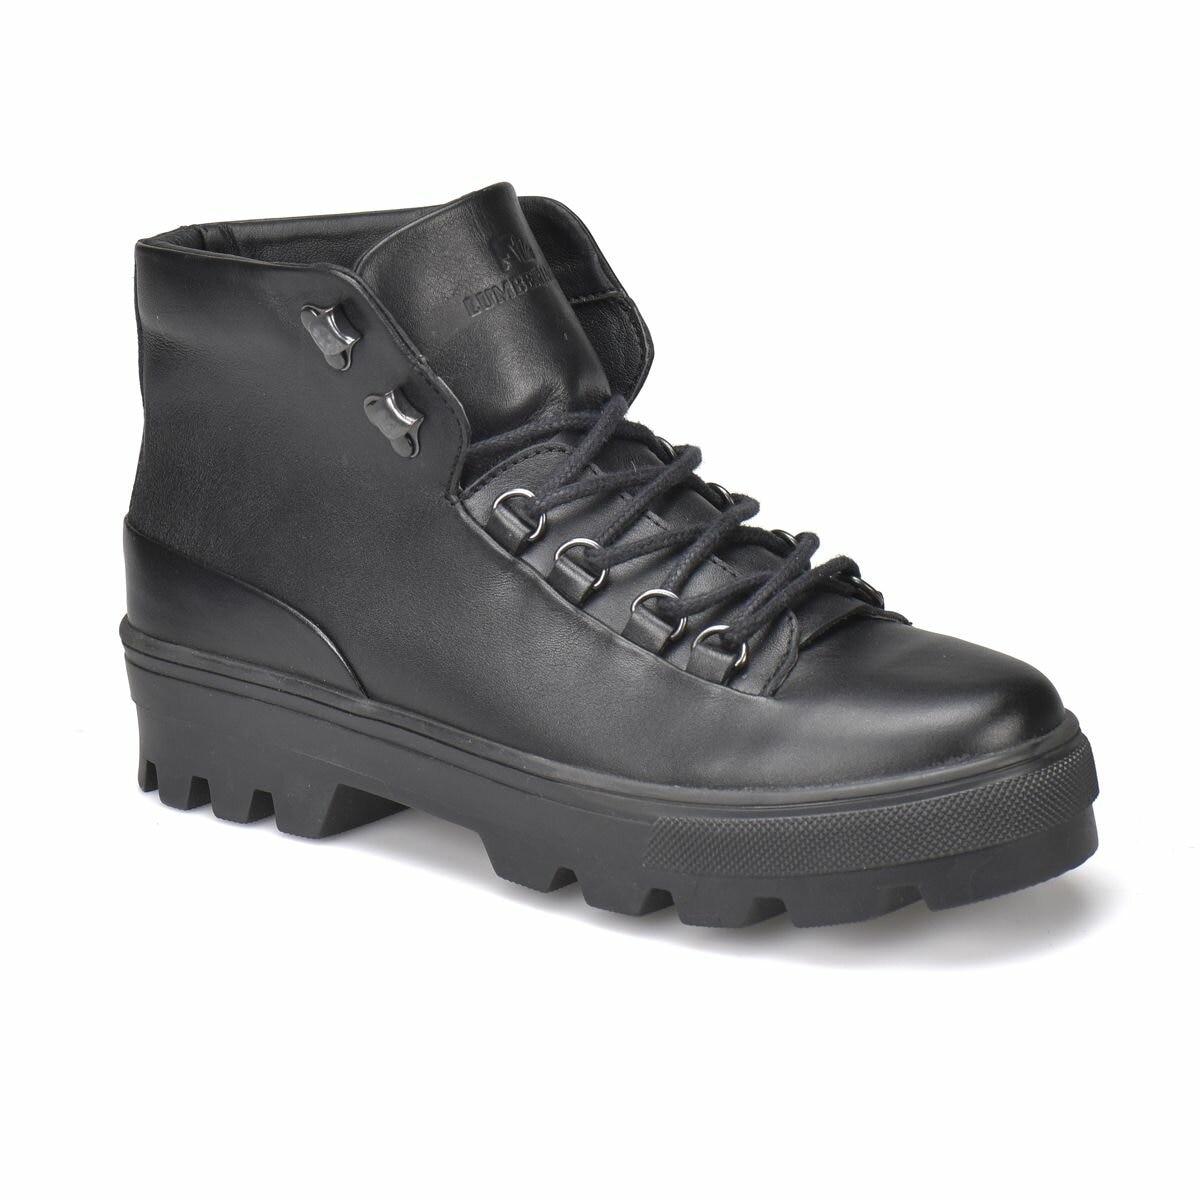 FLO GOLDY Black Women Boots LUMBERJACK